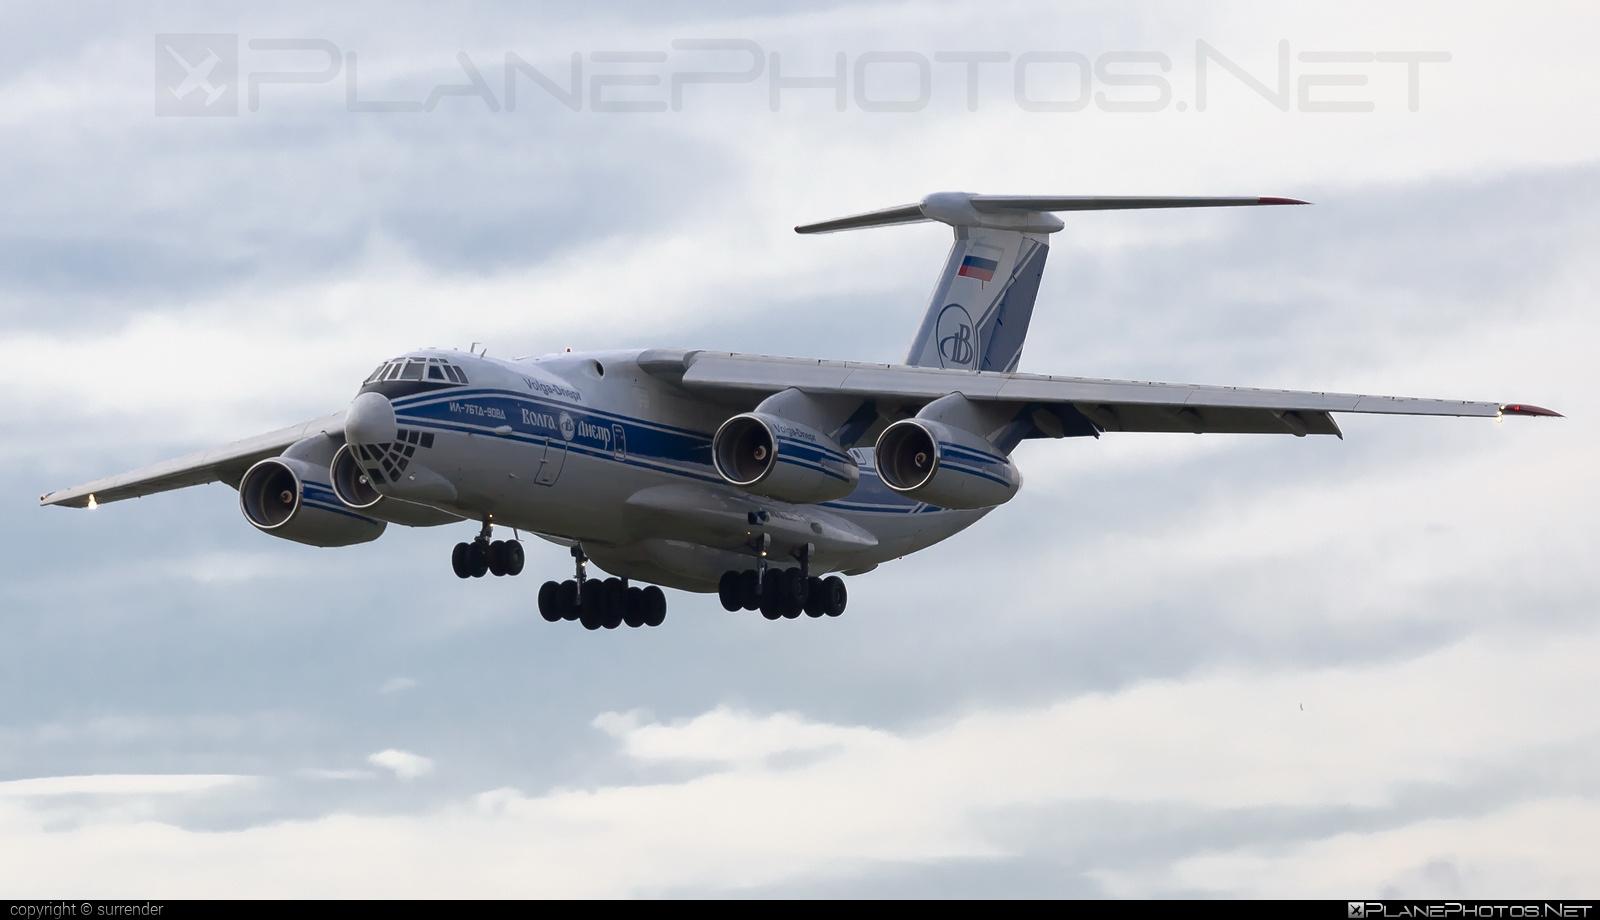 Ilyushin Il-76TD - RA-76511 operated by Volga Dnepr Airlines #il76 #il76td #ilyushin